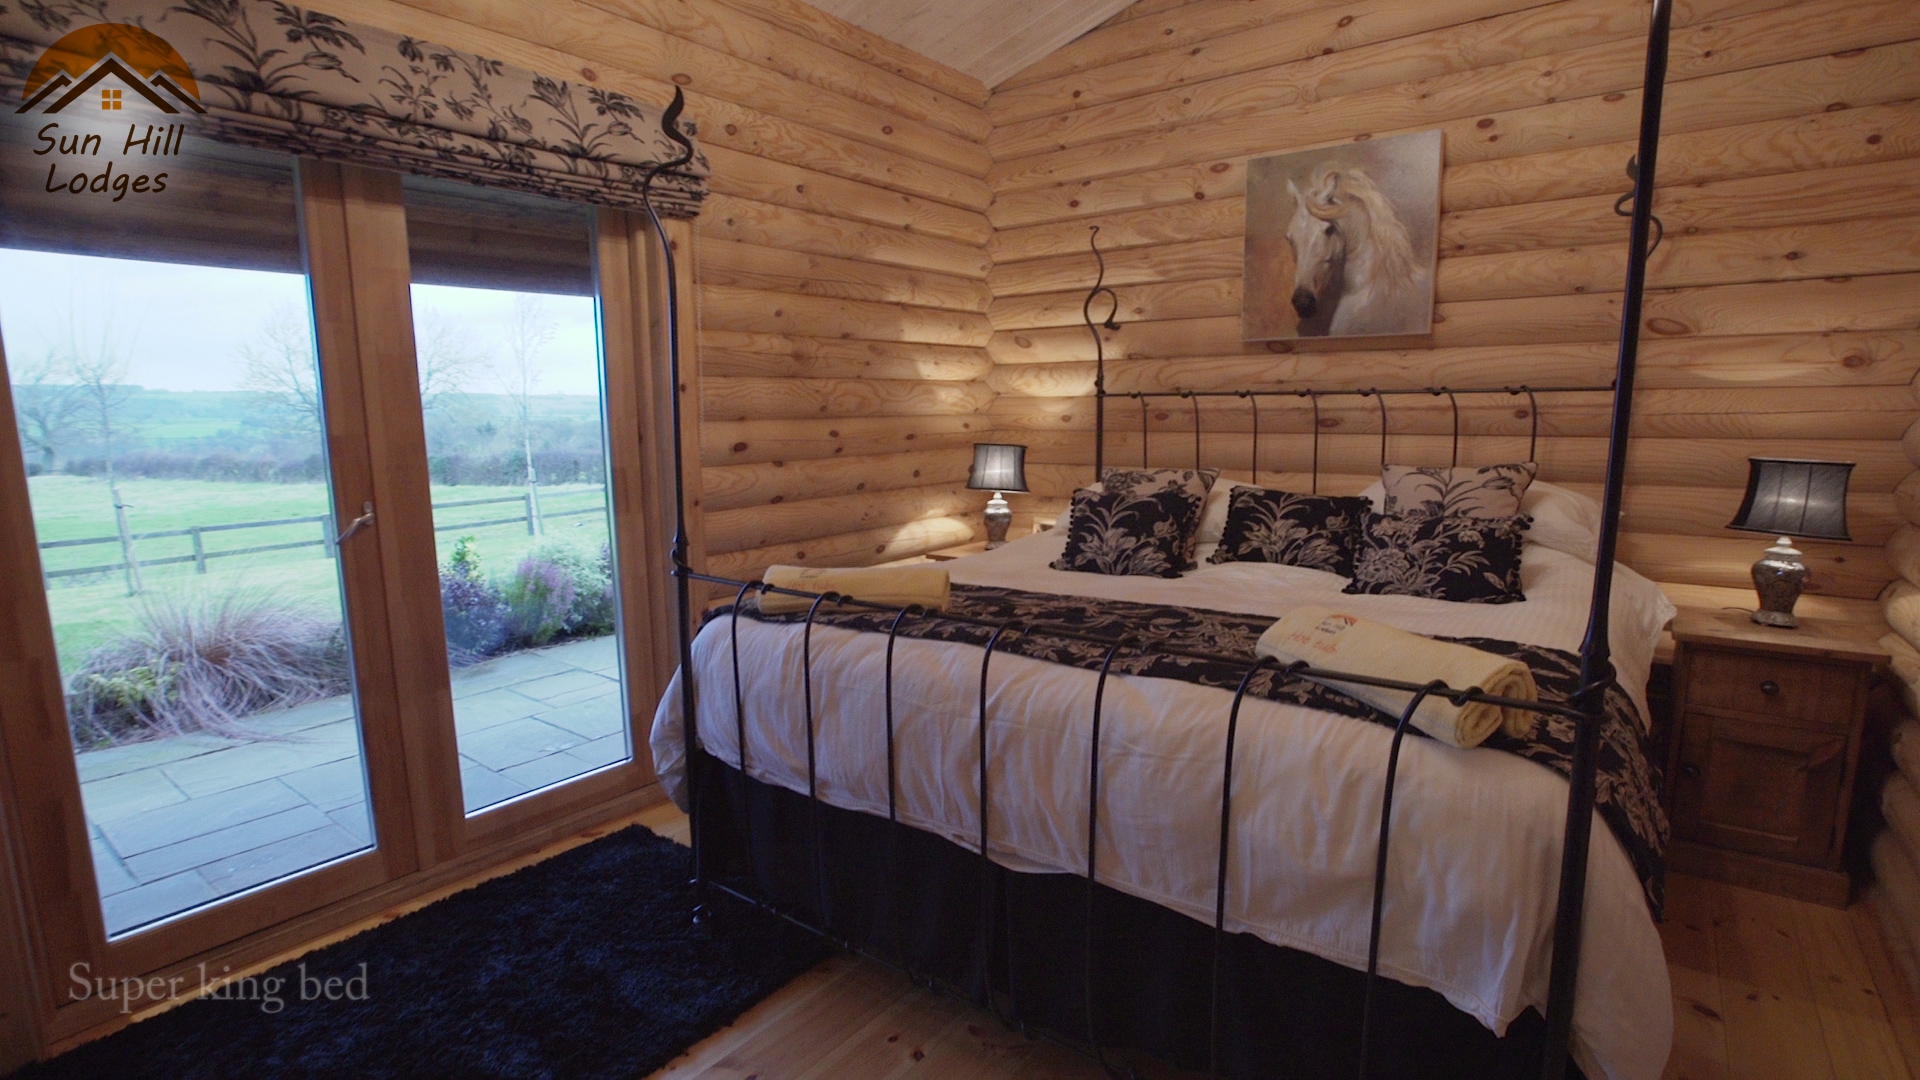 Lodge6_Sunhill.jpg